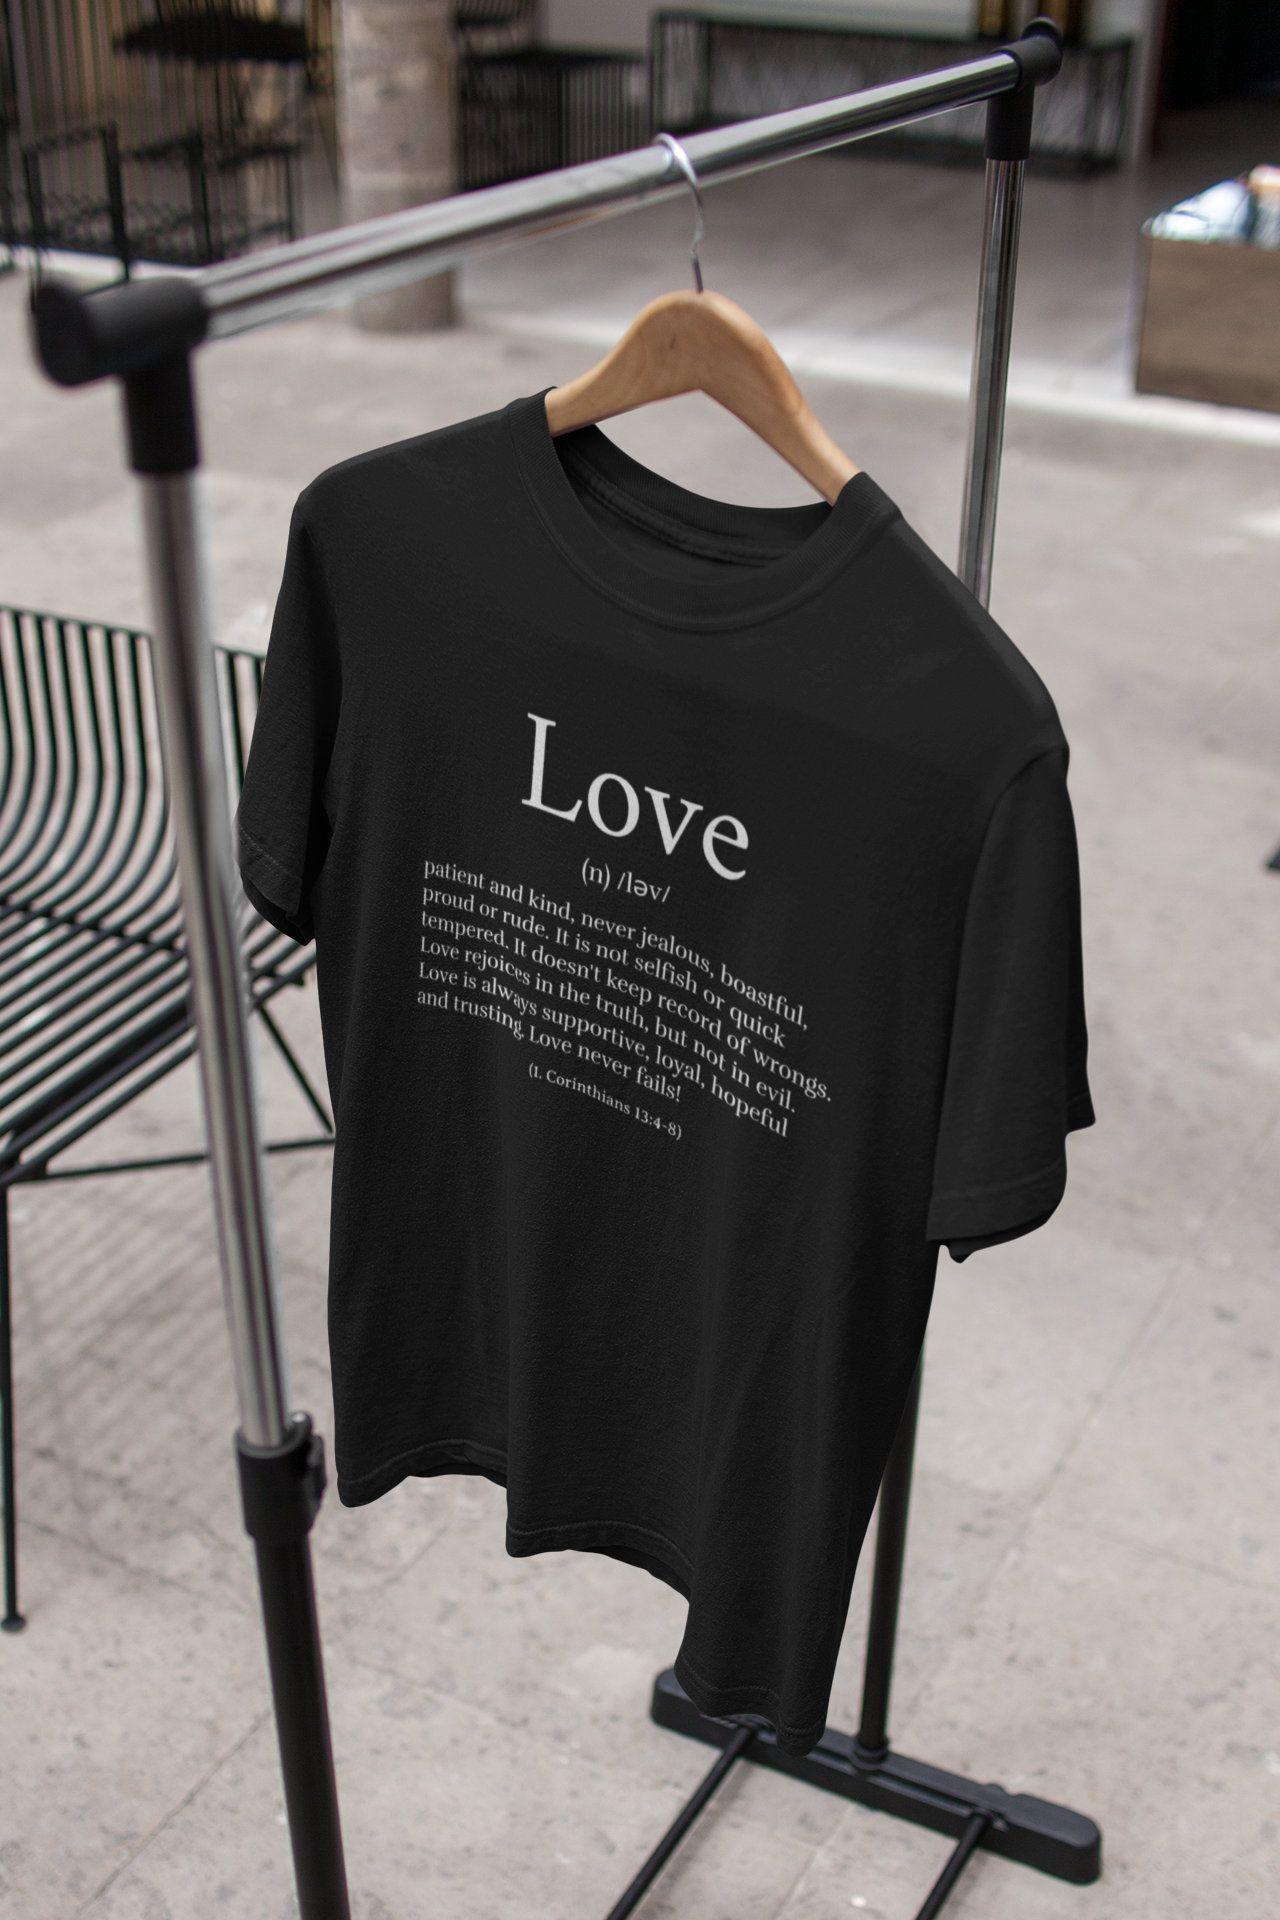 Christian t shirt love definition bible verse clothing